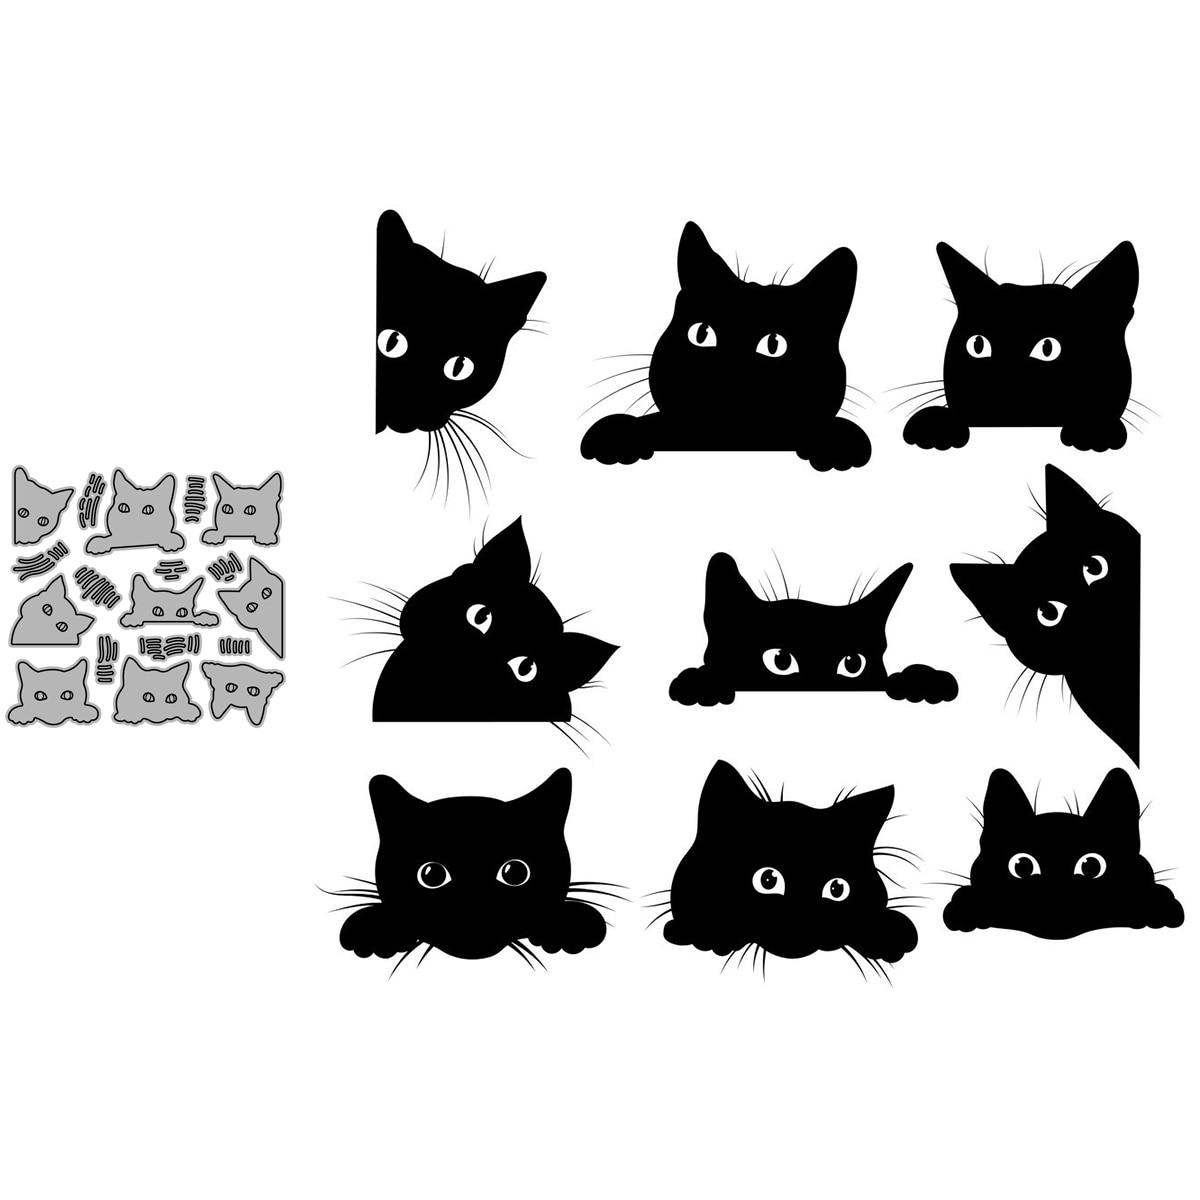 Cute Probe Cat Set Scrapbooking Paper Die Cut Stencils Metal Craft Cutting Dies Embossing For Crads Making 2021